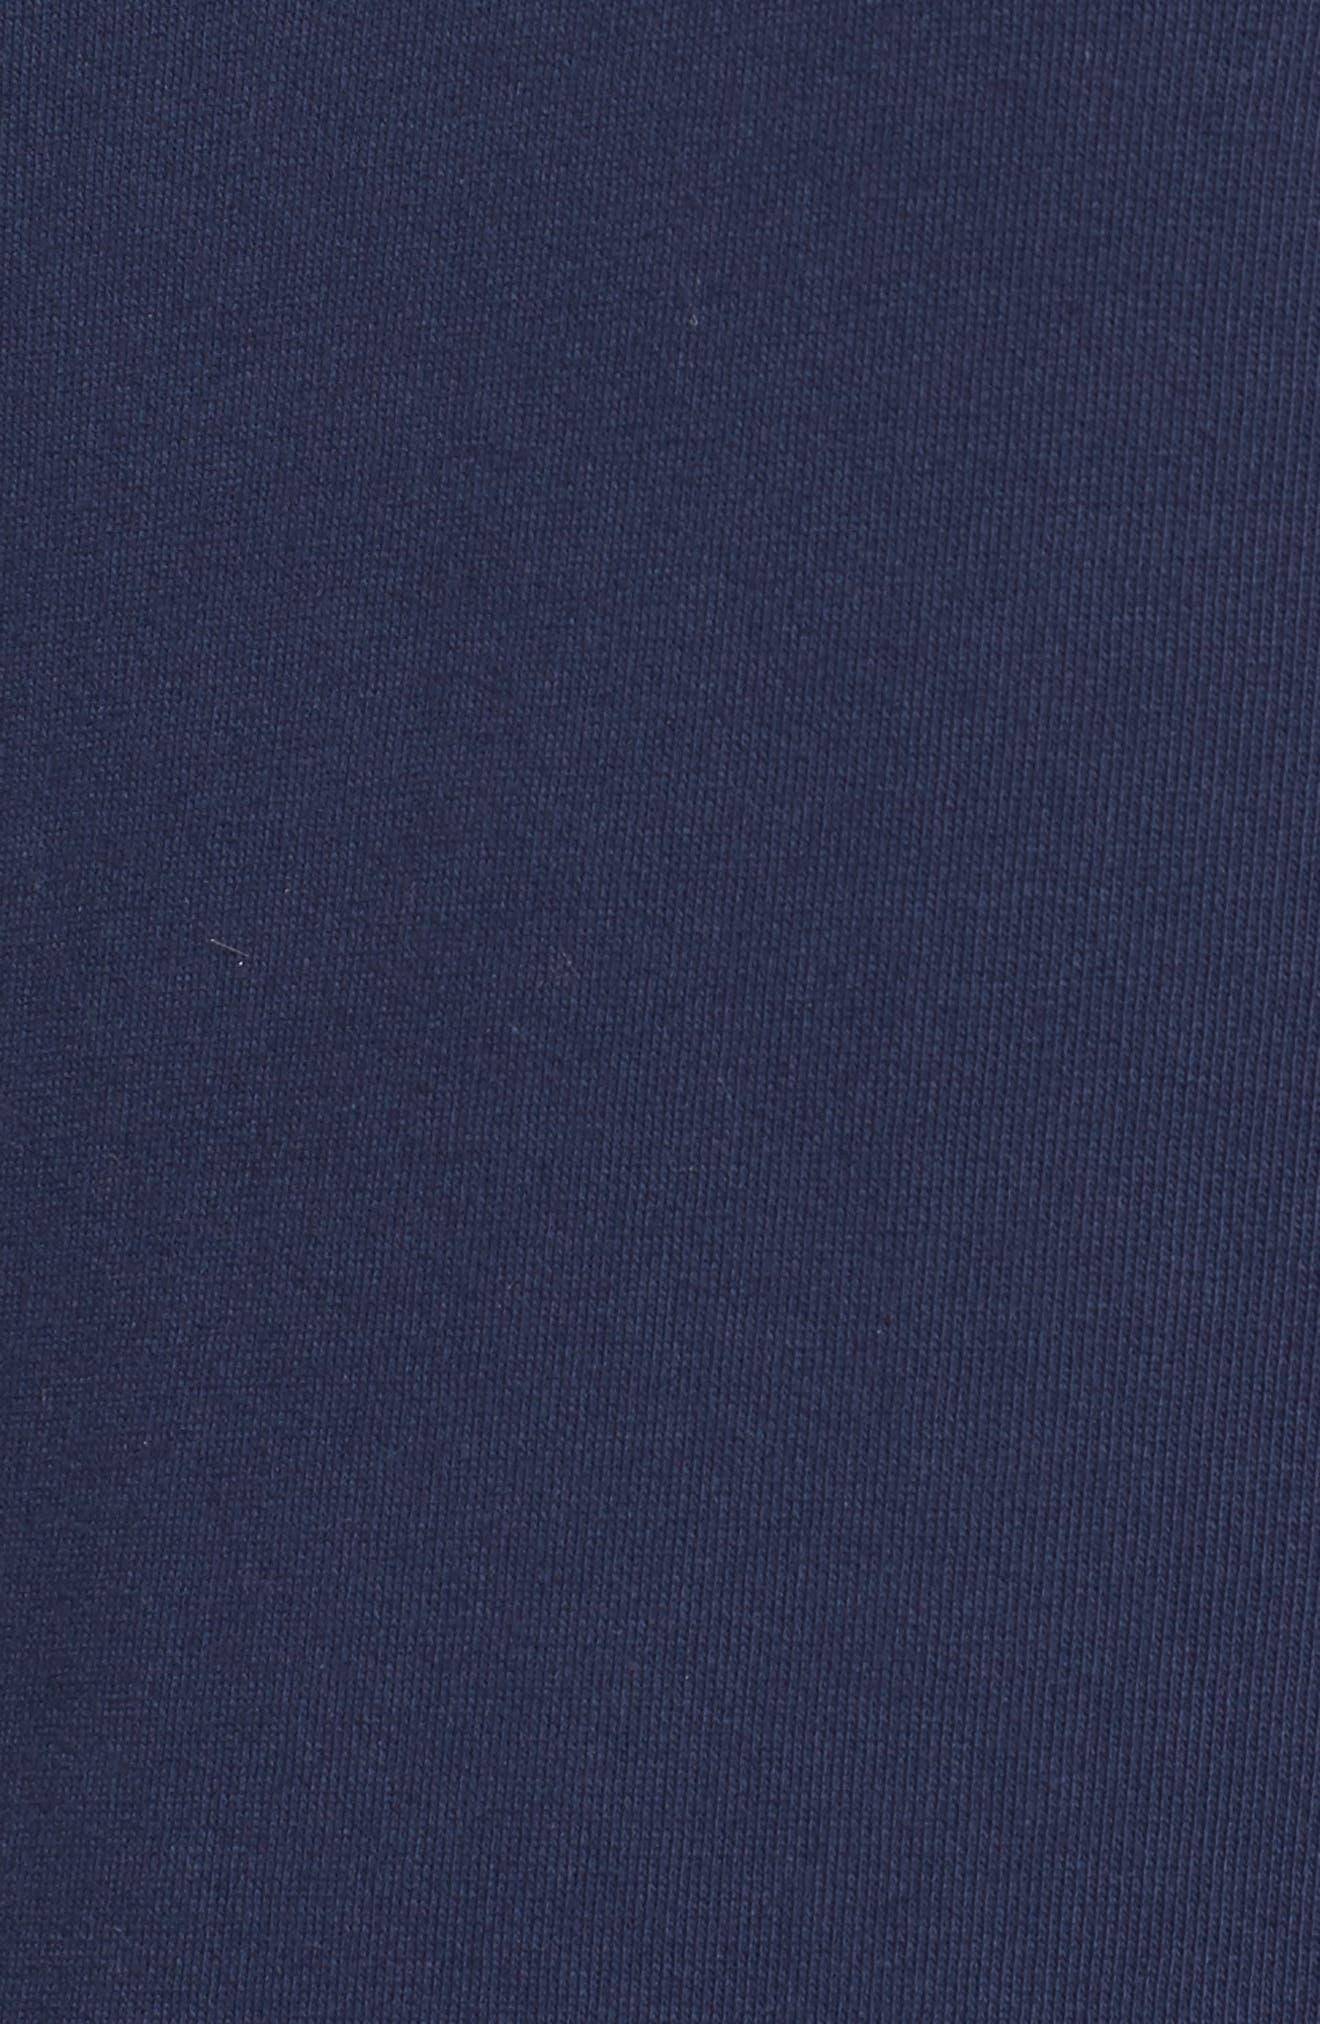 Embroidered Sleeve Sweatshirt,                             Alternate thumbnail 5, color,                             410